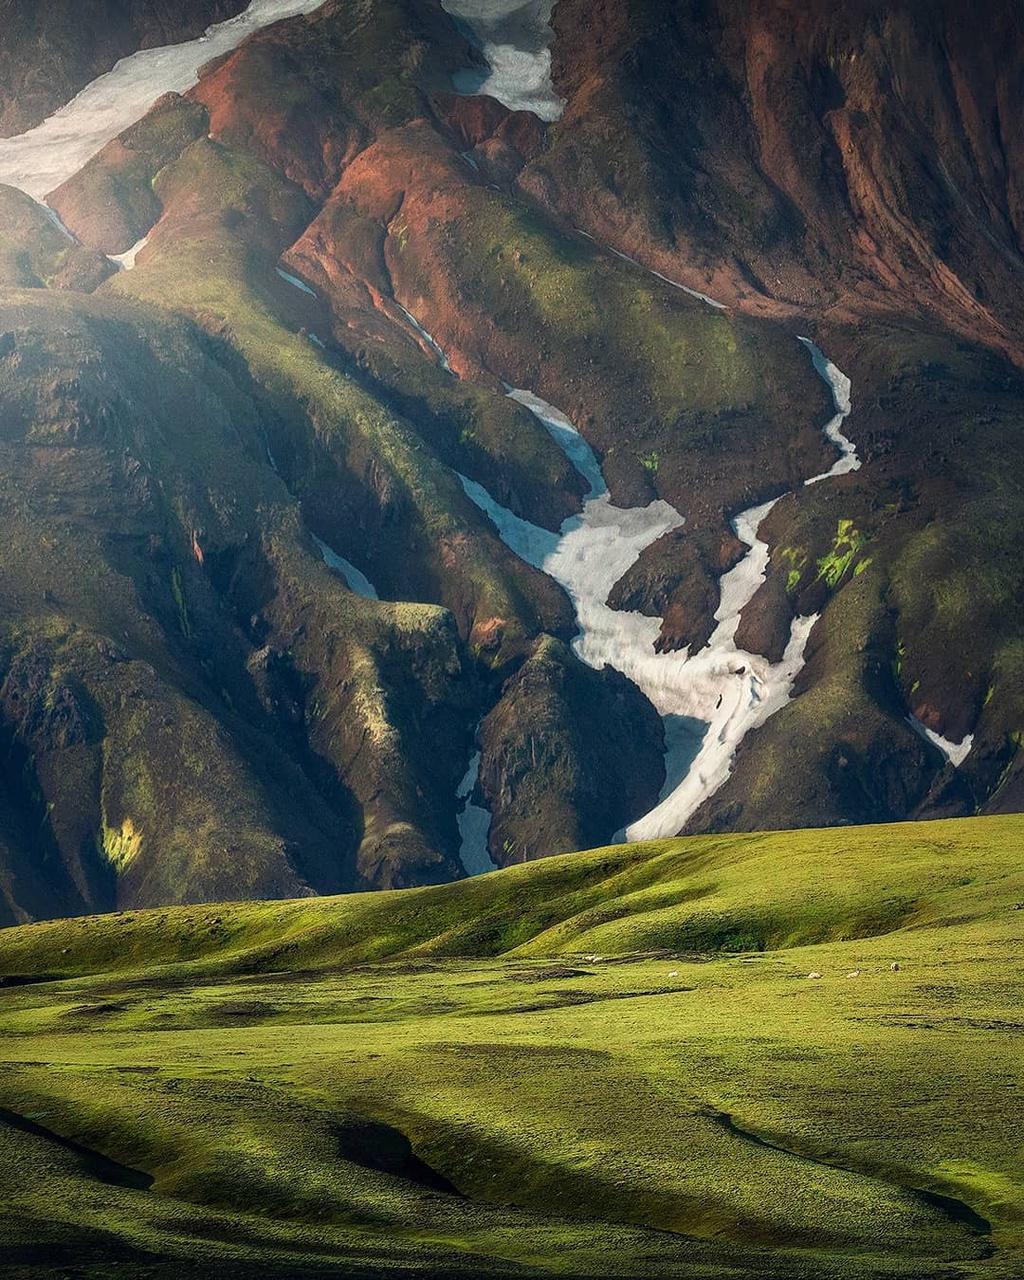 nhung-mien-dat-mau-xanh-o-Iceland-ivivu-15